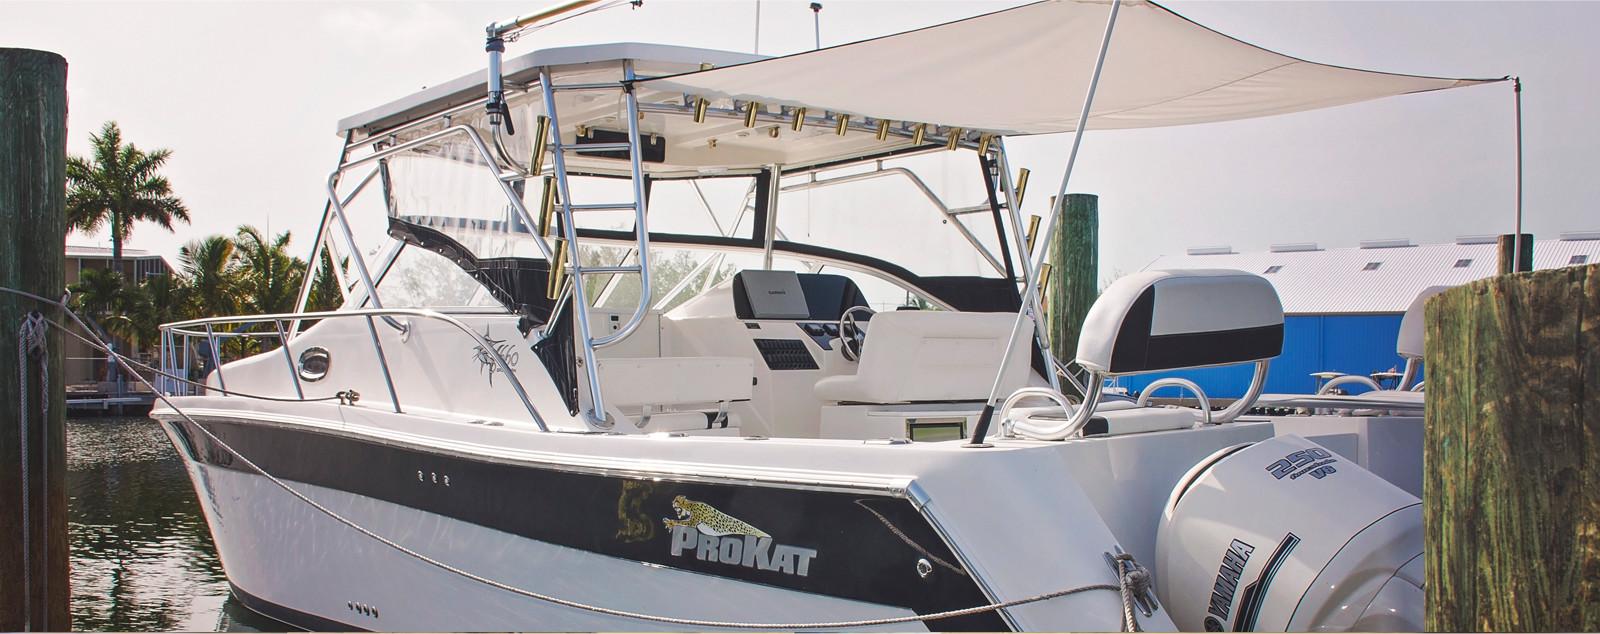 florida keys boat ramp